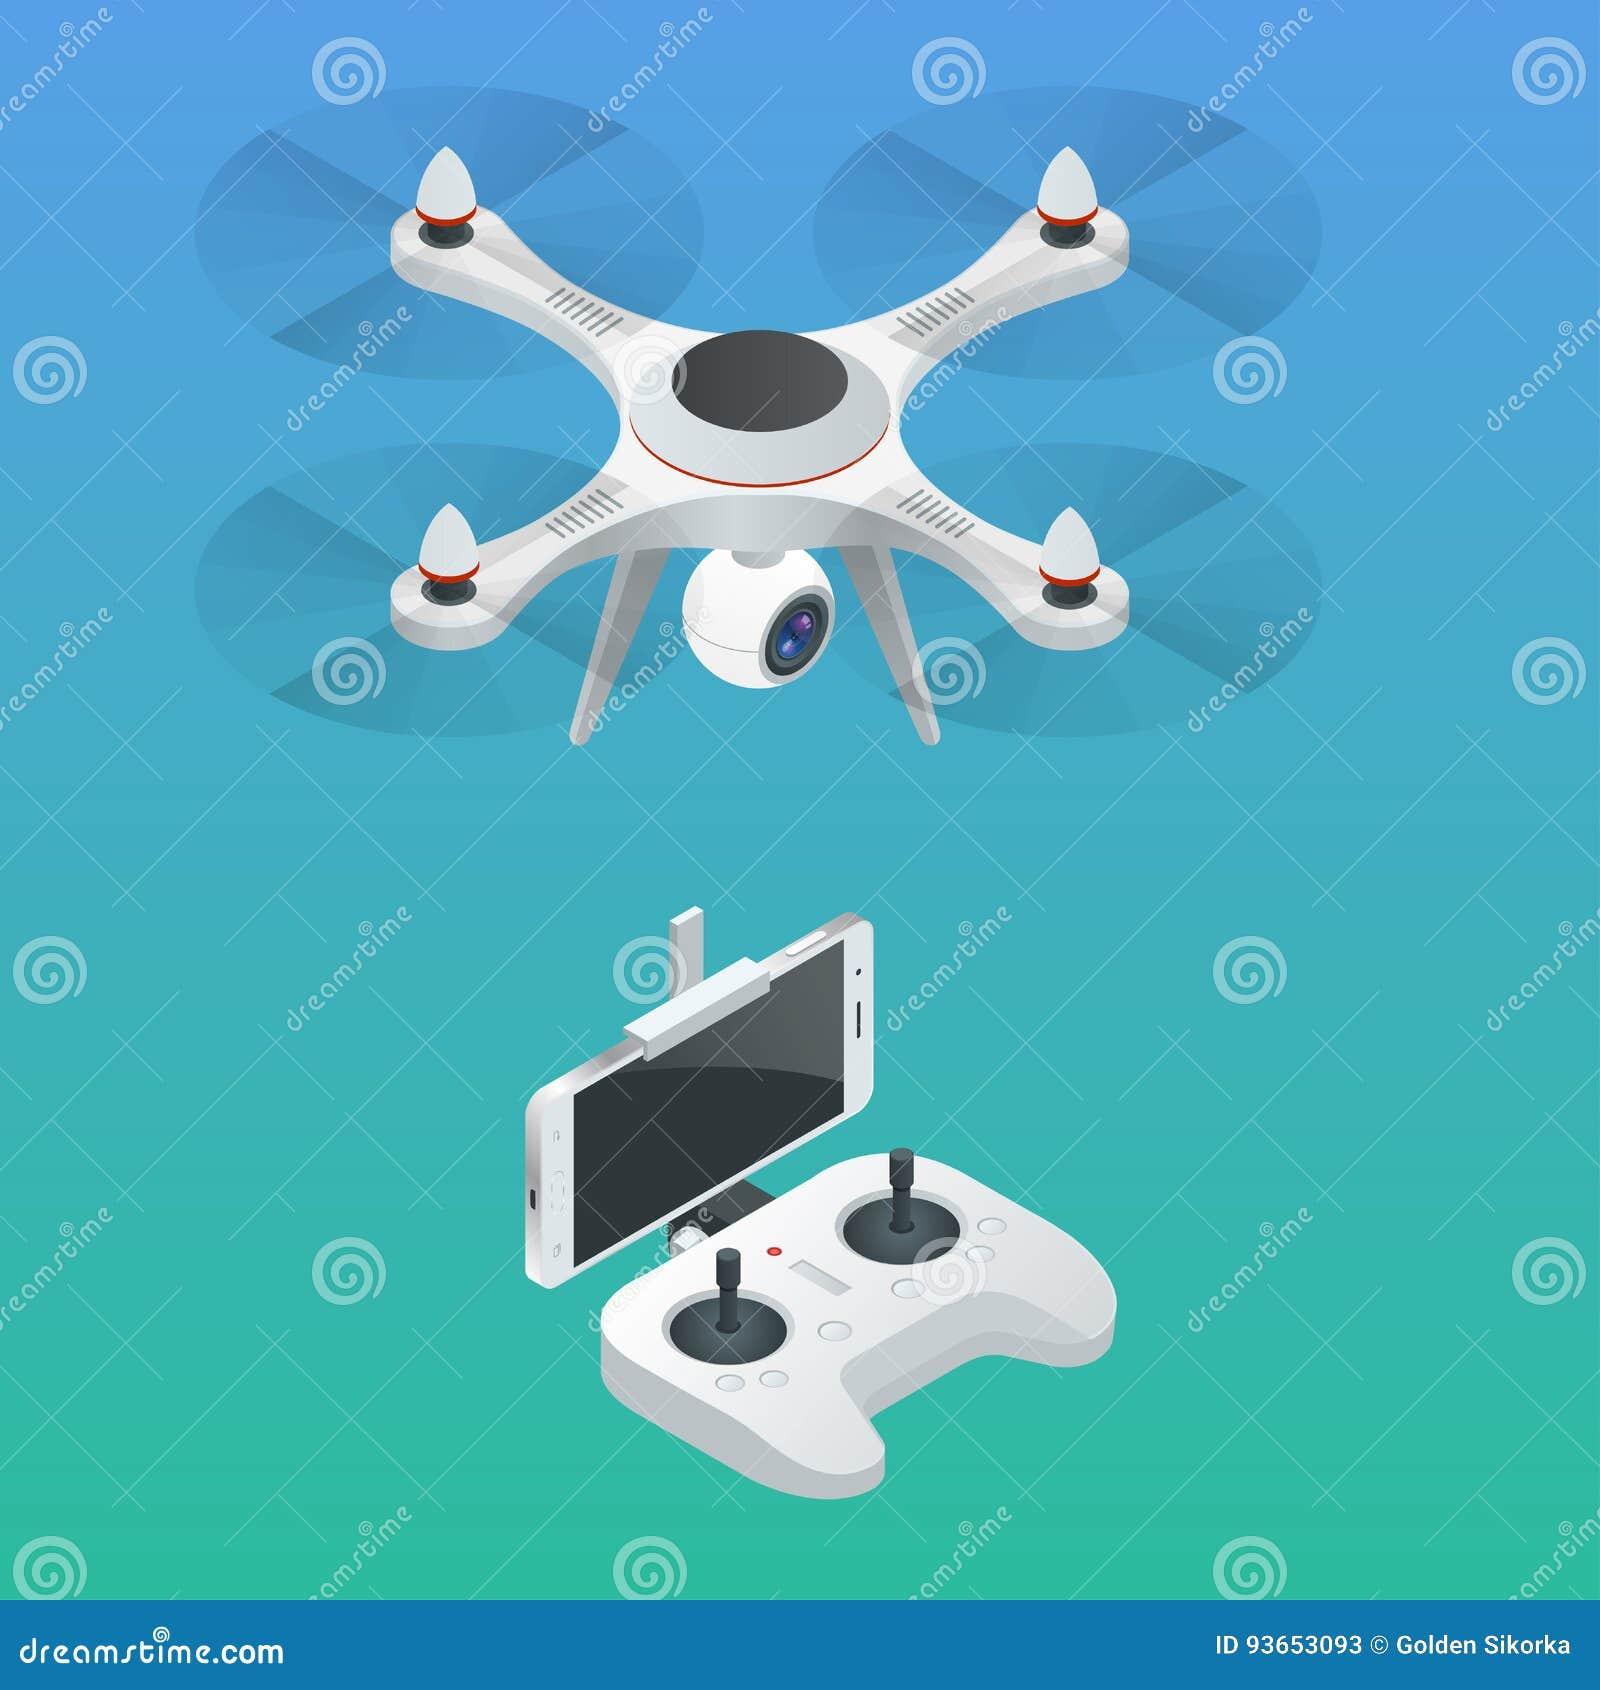 Isometric ραδιο-ελεγχόμενος κηφήνας Εξοπλισμός βίντεο και φωτογραφίας καινοτομίας επίσης corel σύρετε το διάνυσμα απεικόνισης